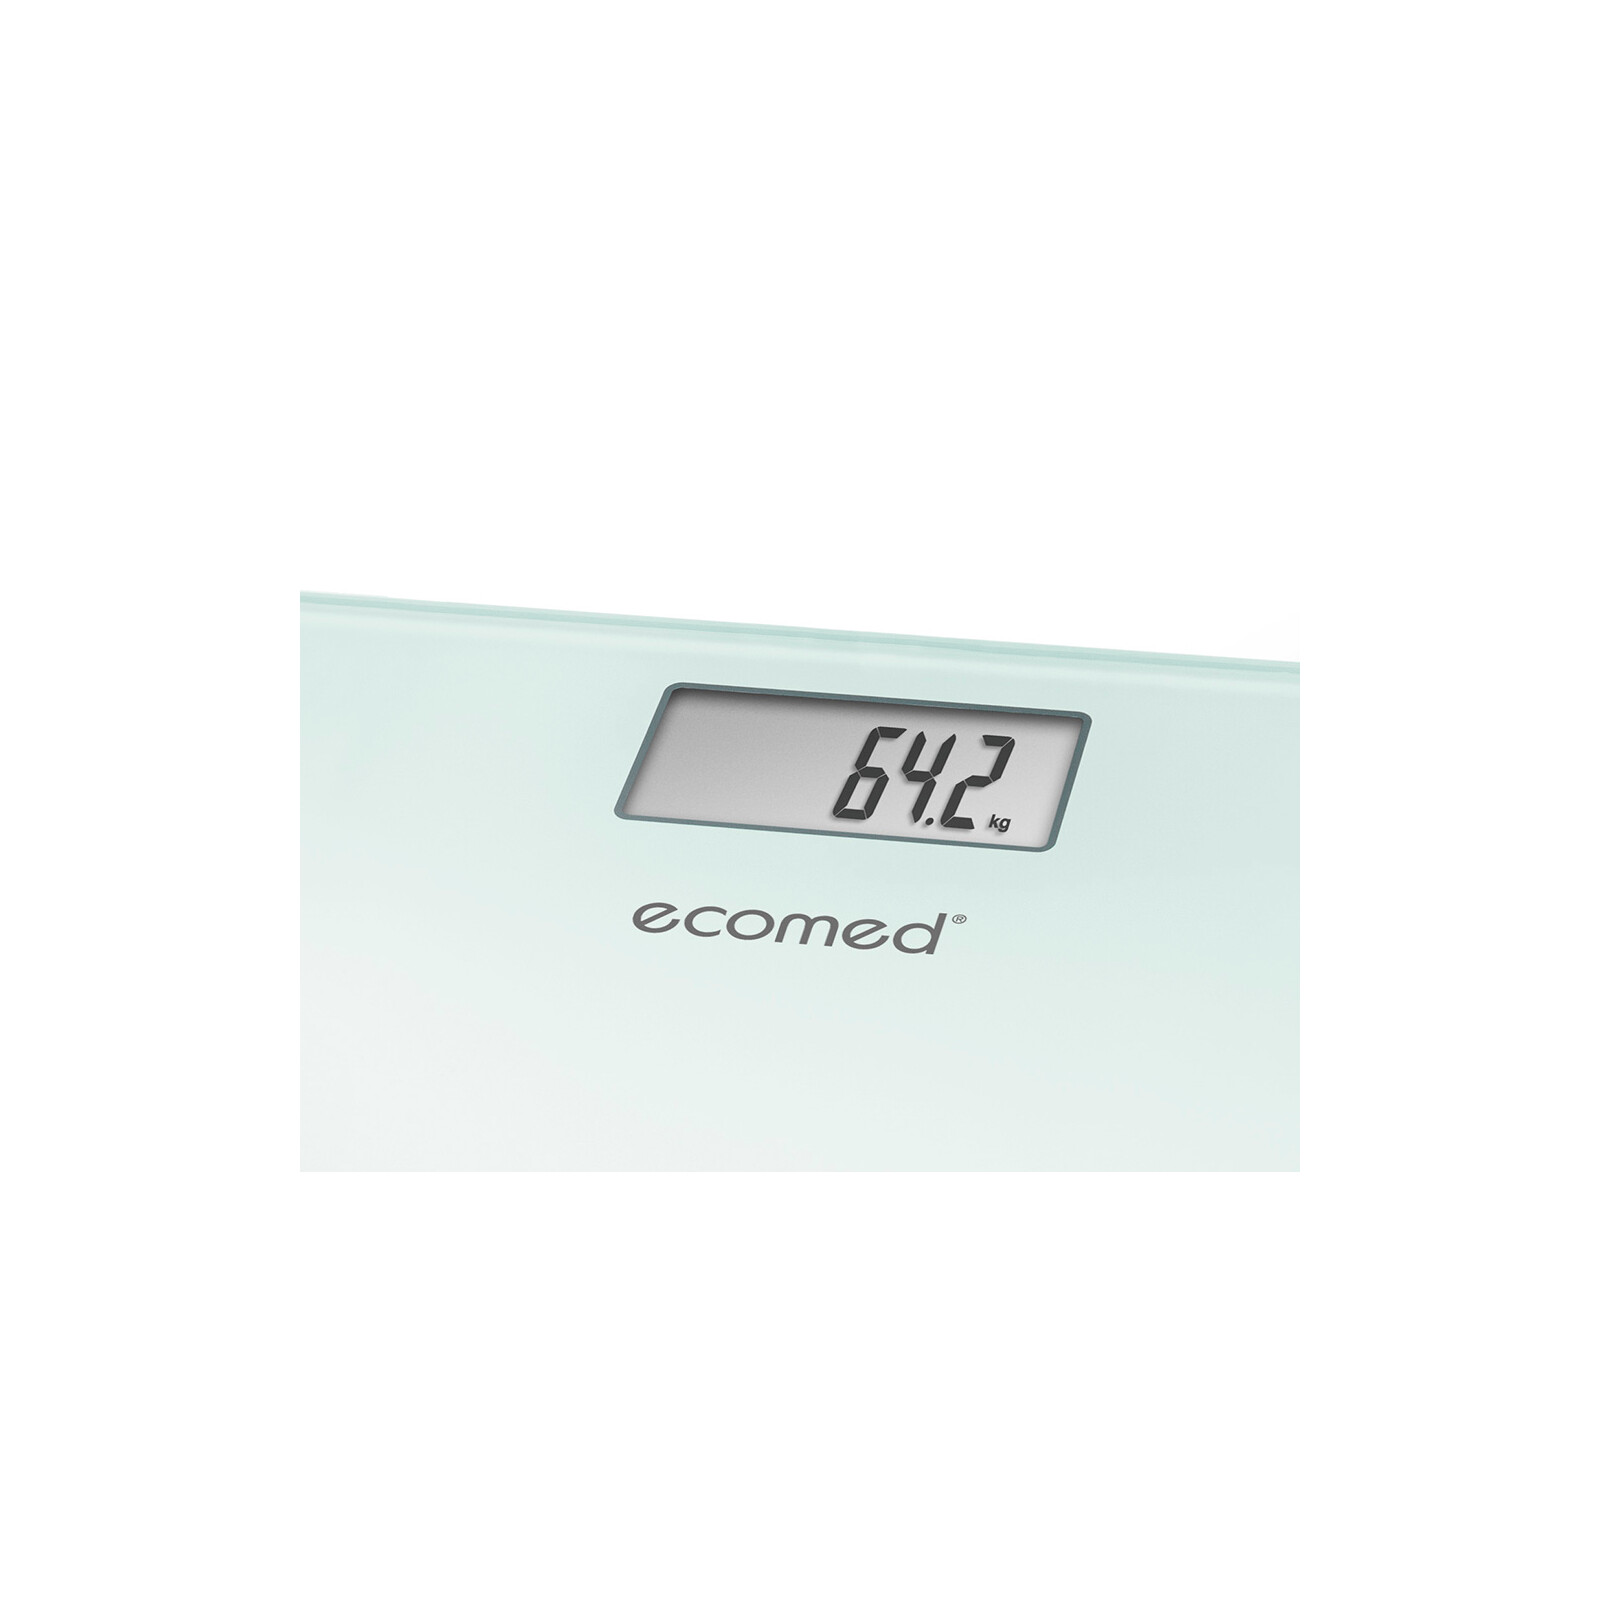 Ecomed PS-72E Körperanalysewaage